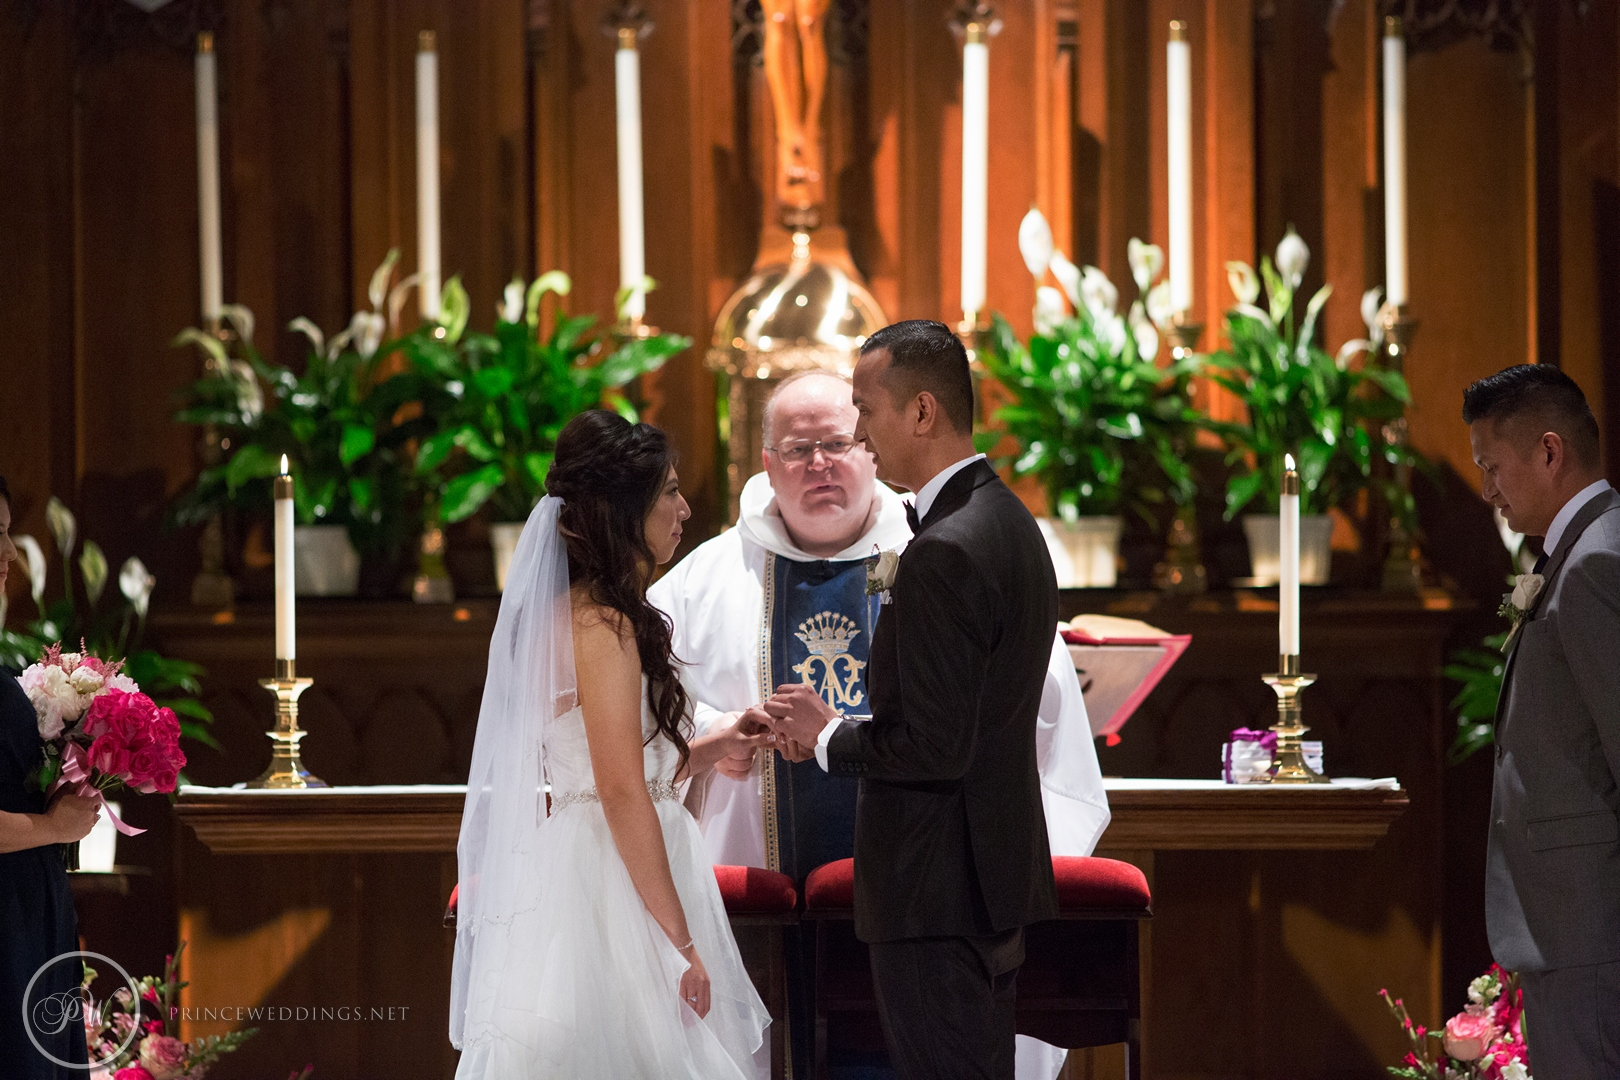 Castaway_Burbank_Wedding_Photo_Christian_Autumn029.jpg